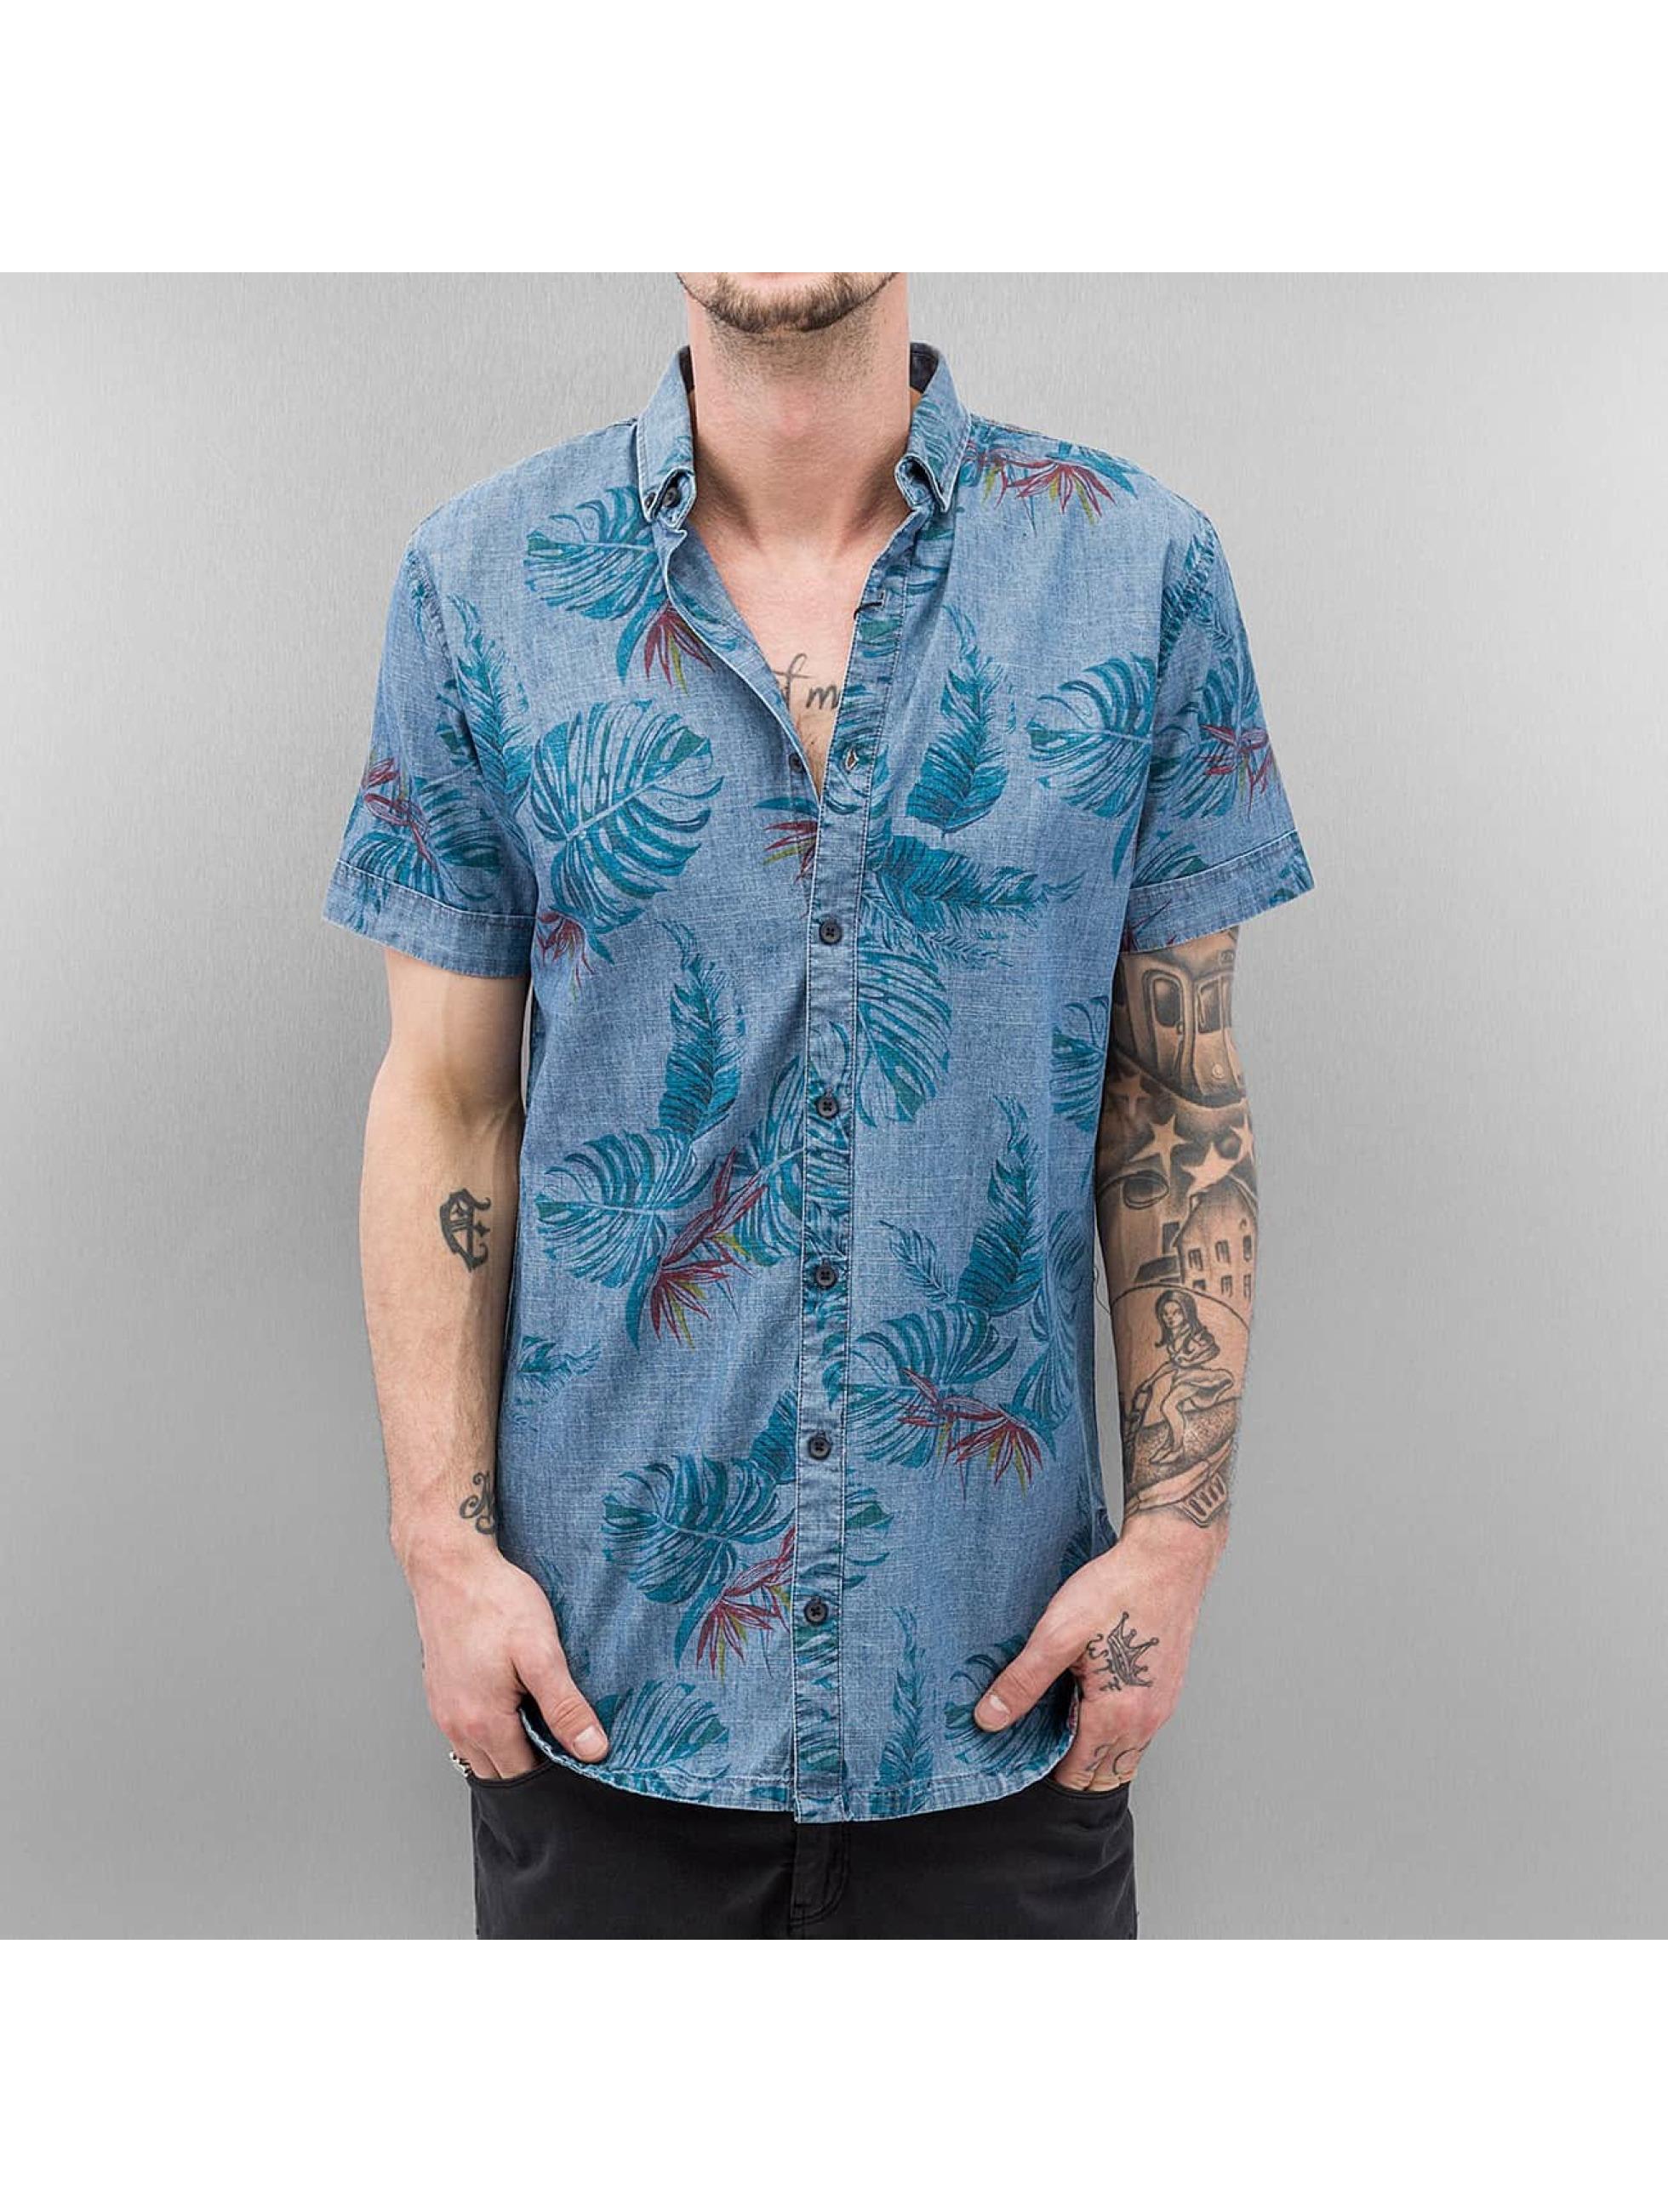 SHINE Original overhemd Palm Print blauw